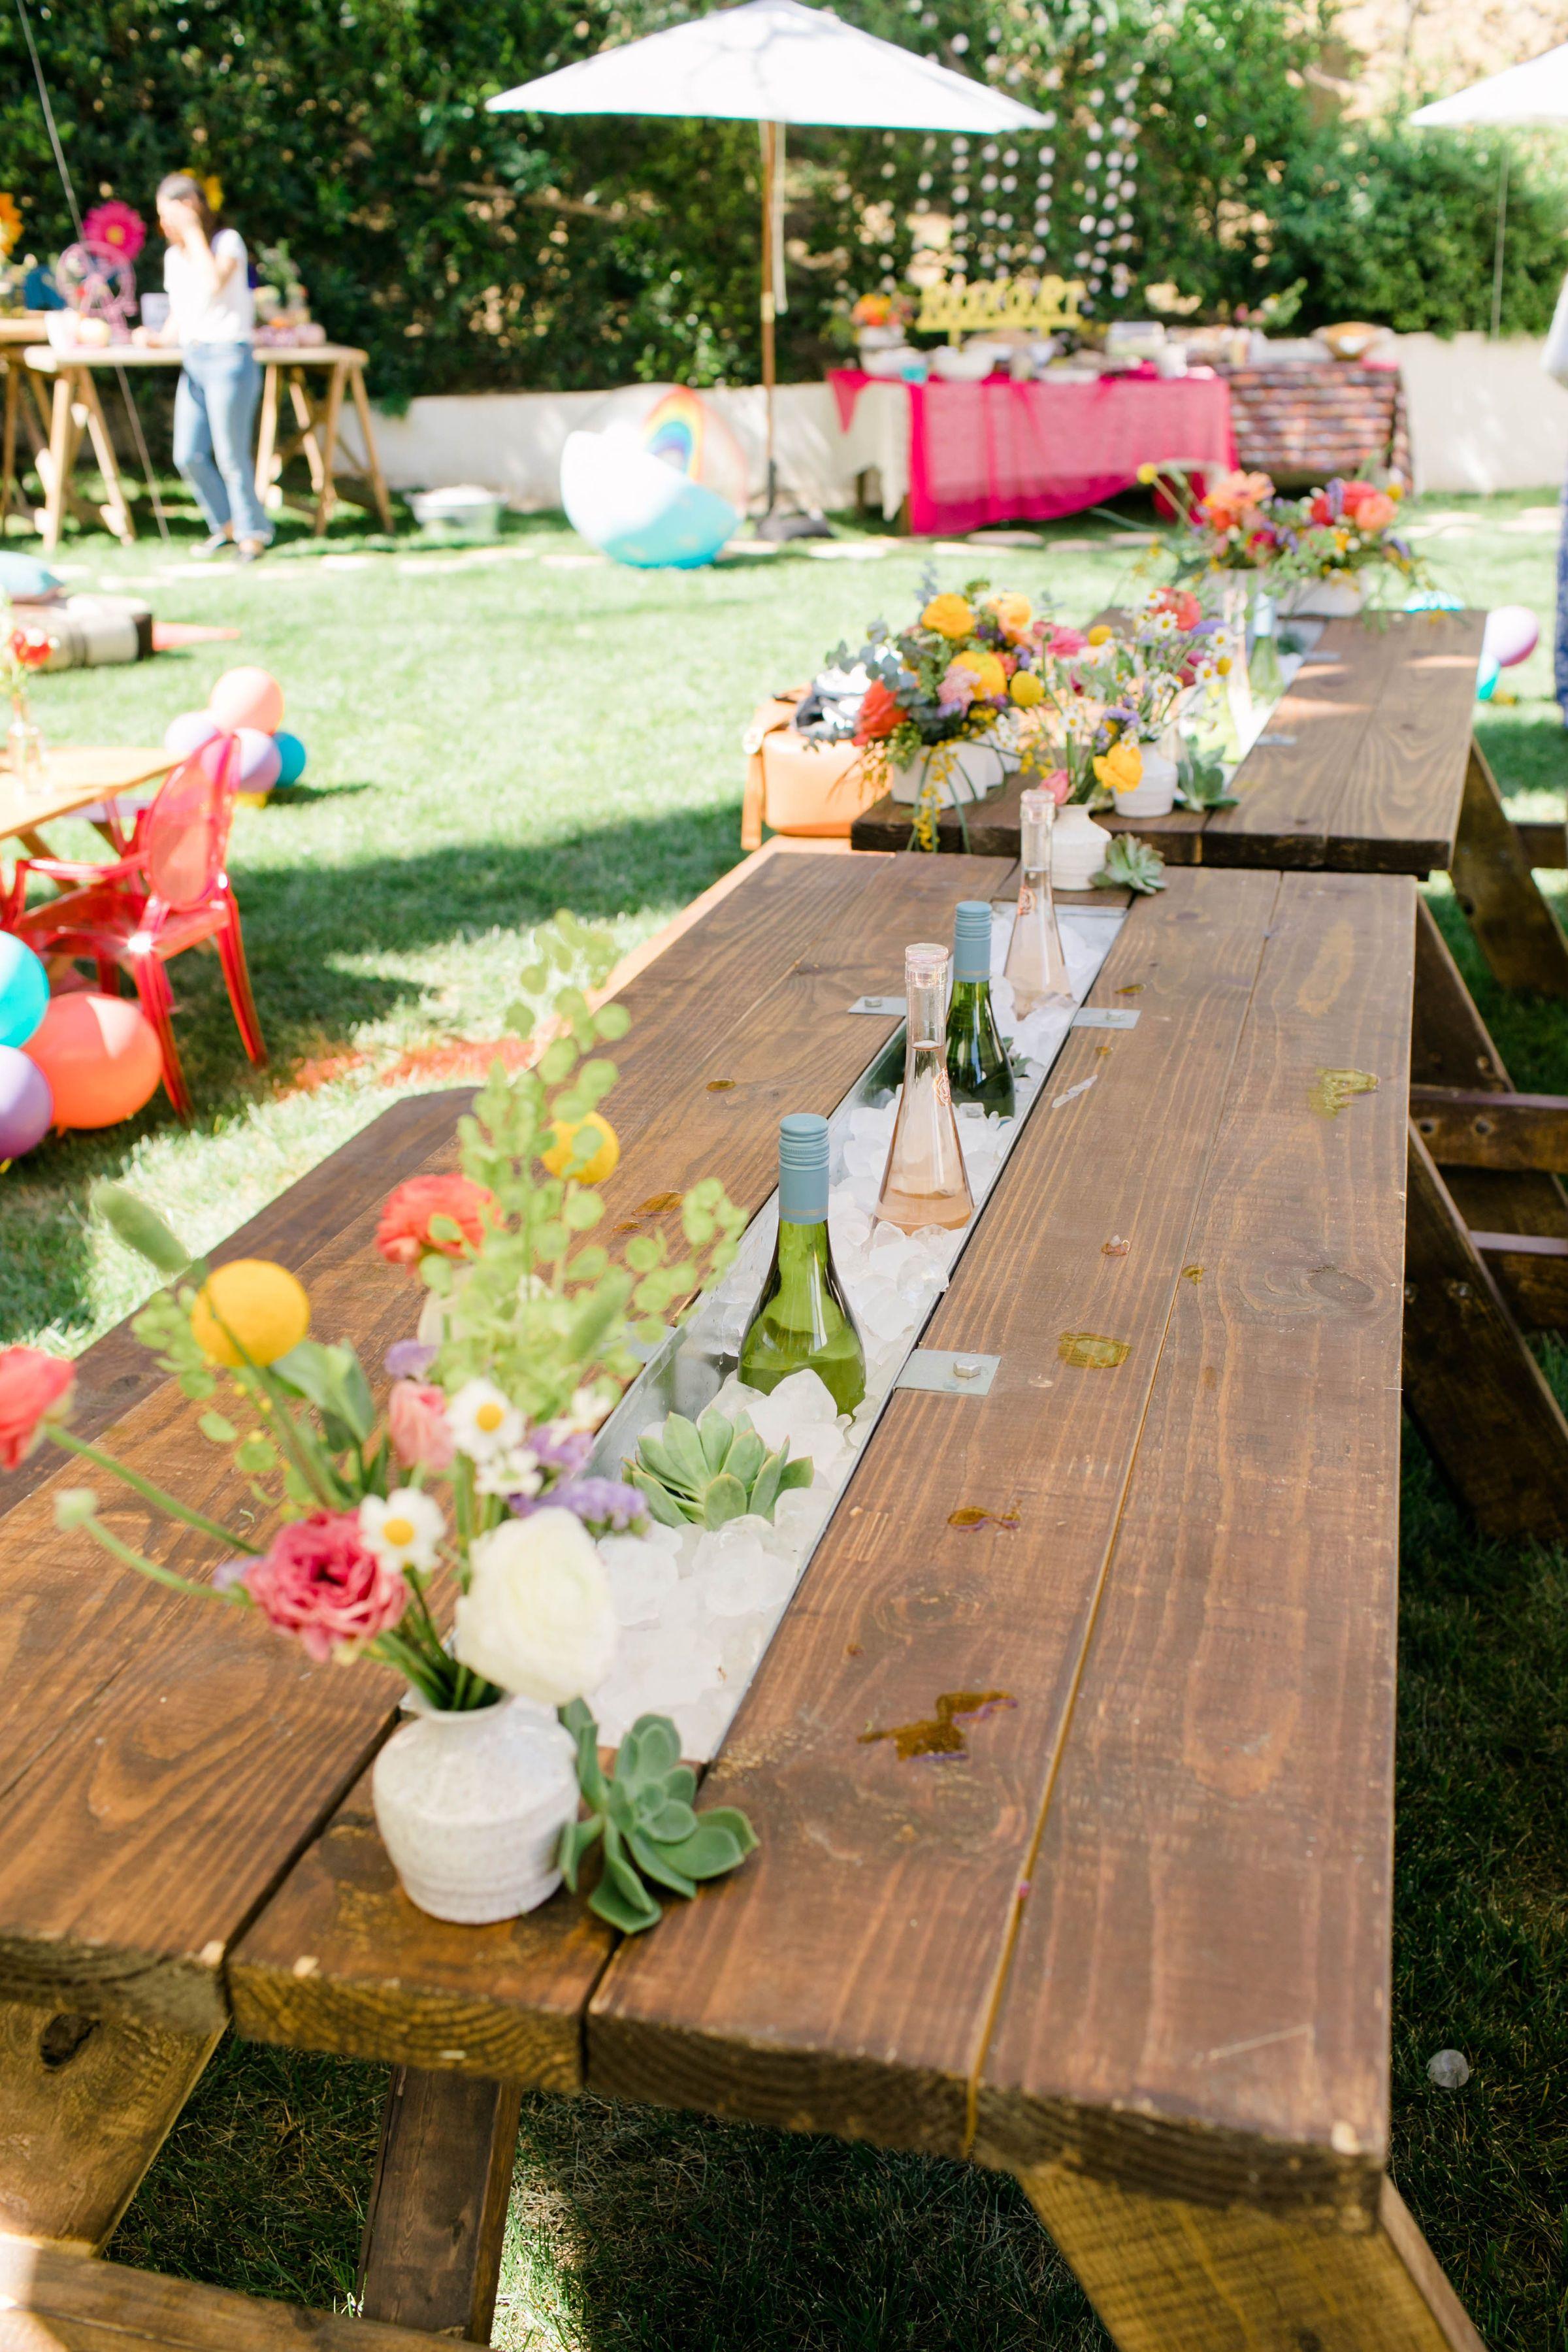 Boho drink table drink table bath table picnic table